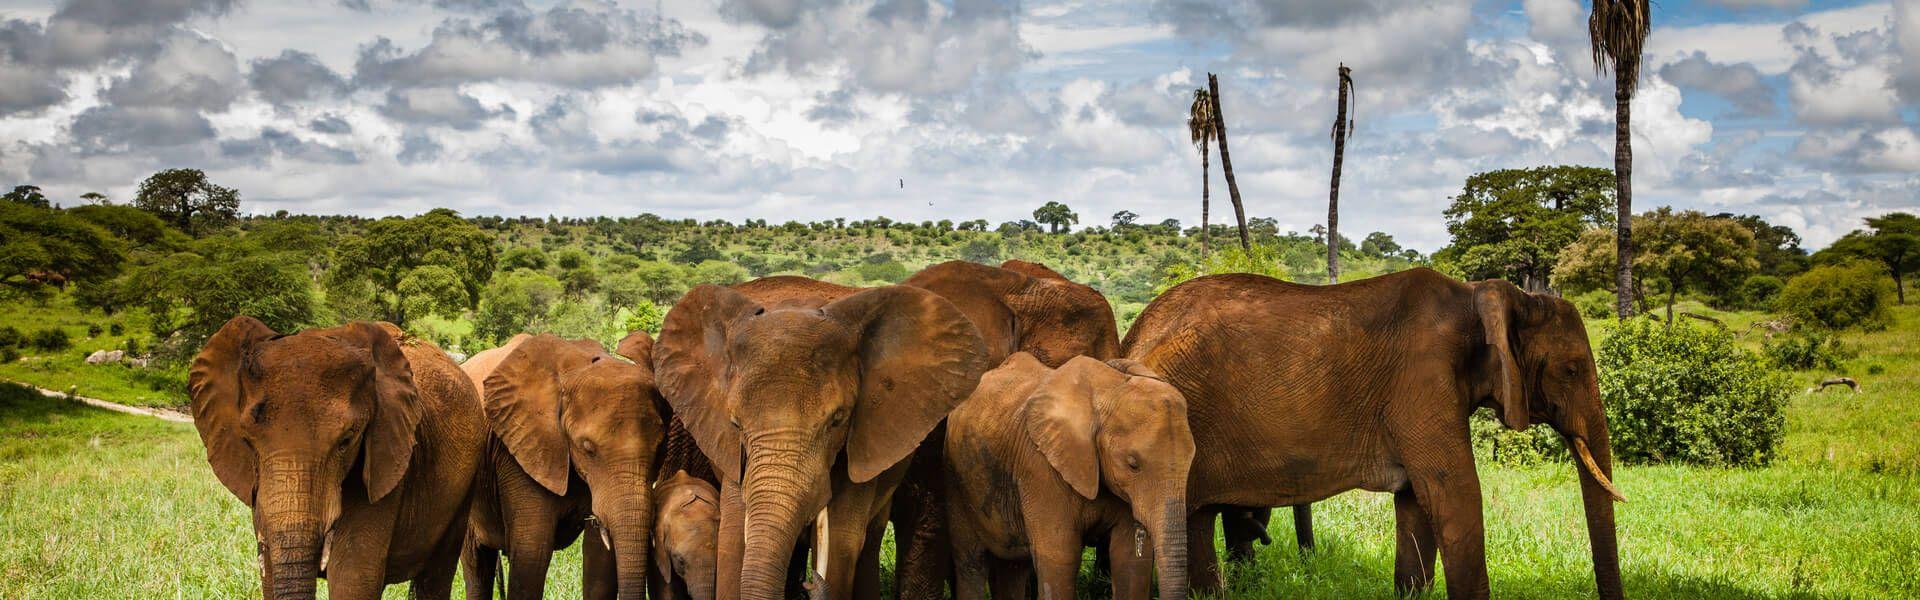 Singlereis Zanzibar & safari Tanzania